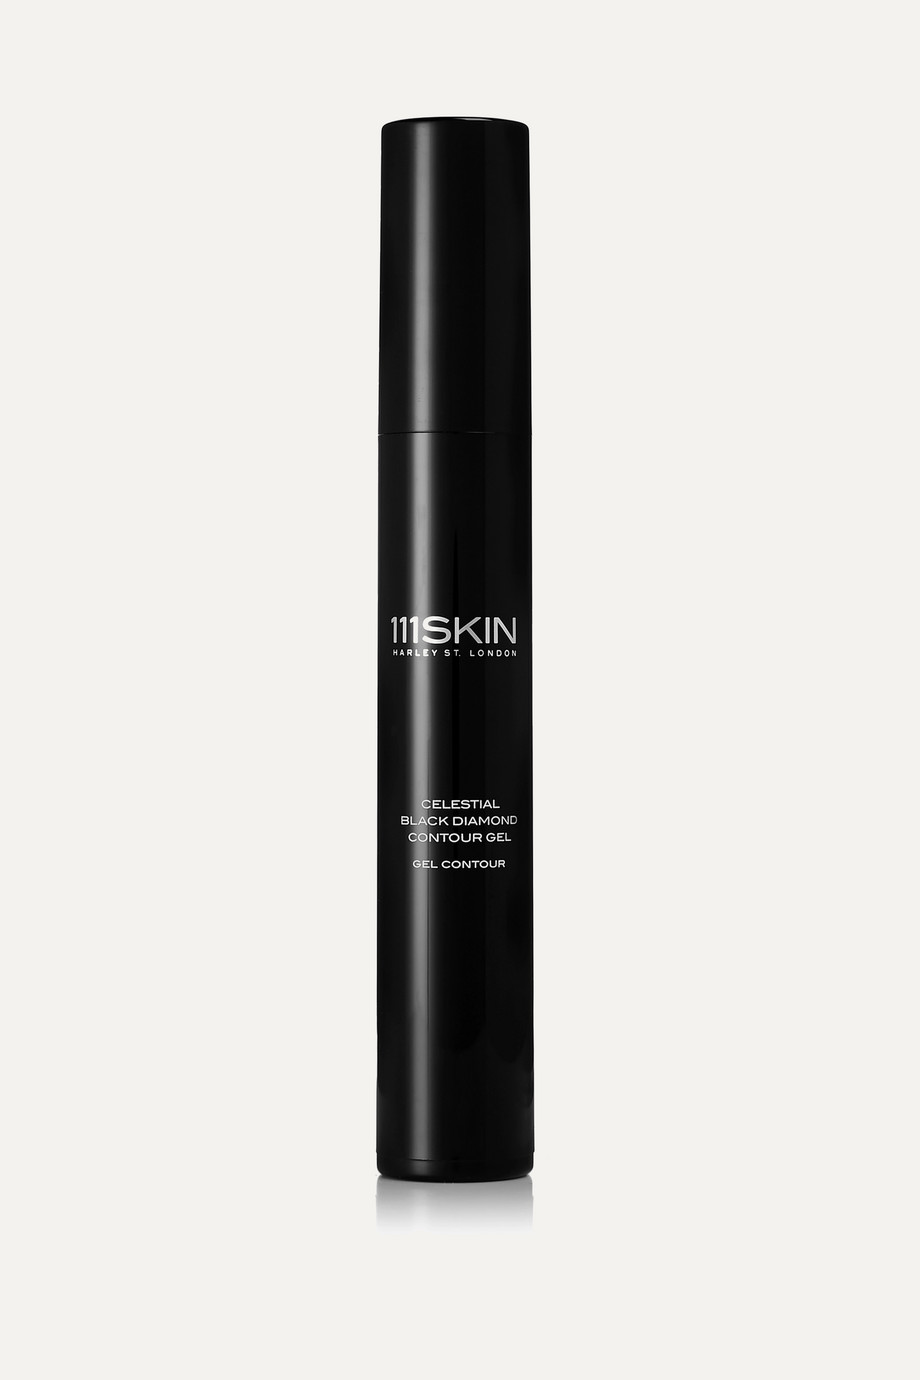 111SKIN Celestial Black Diamond Contour Gel, 15 ml – Konturengel